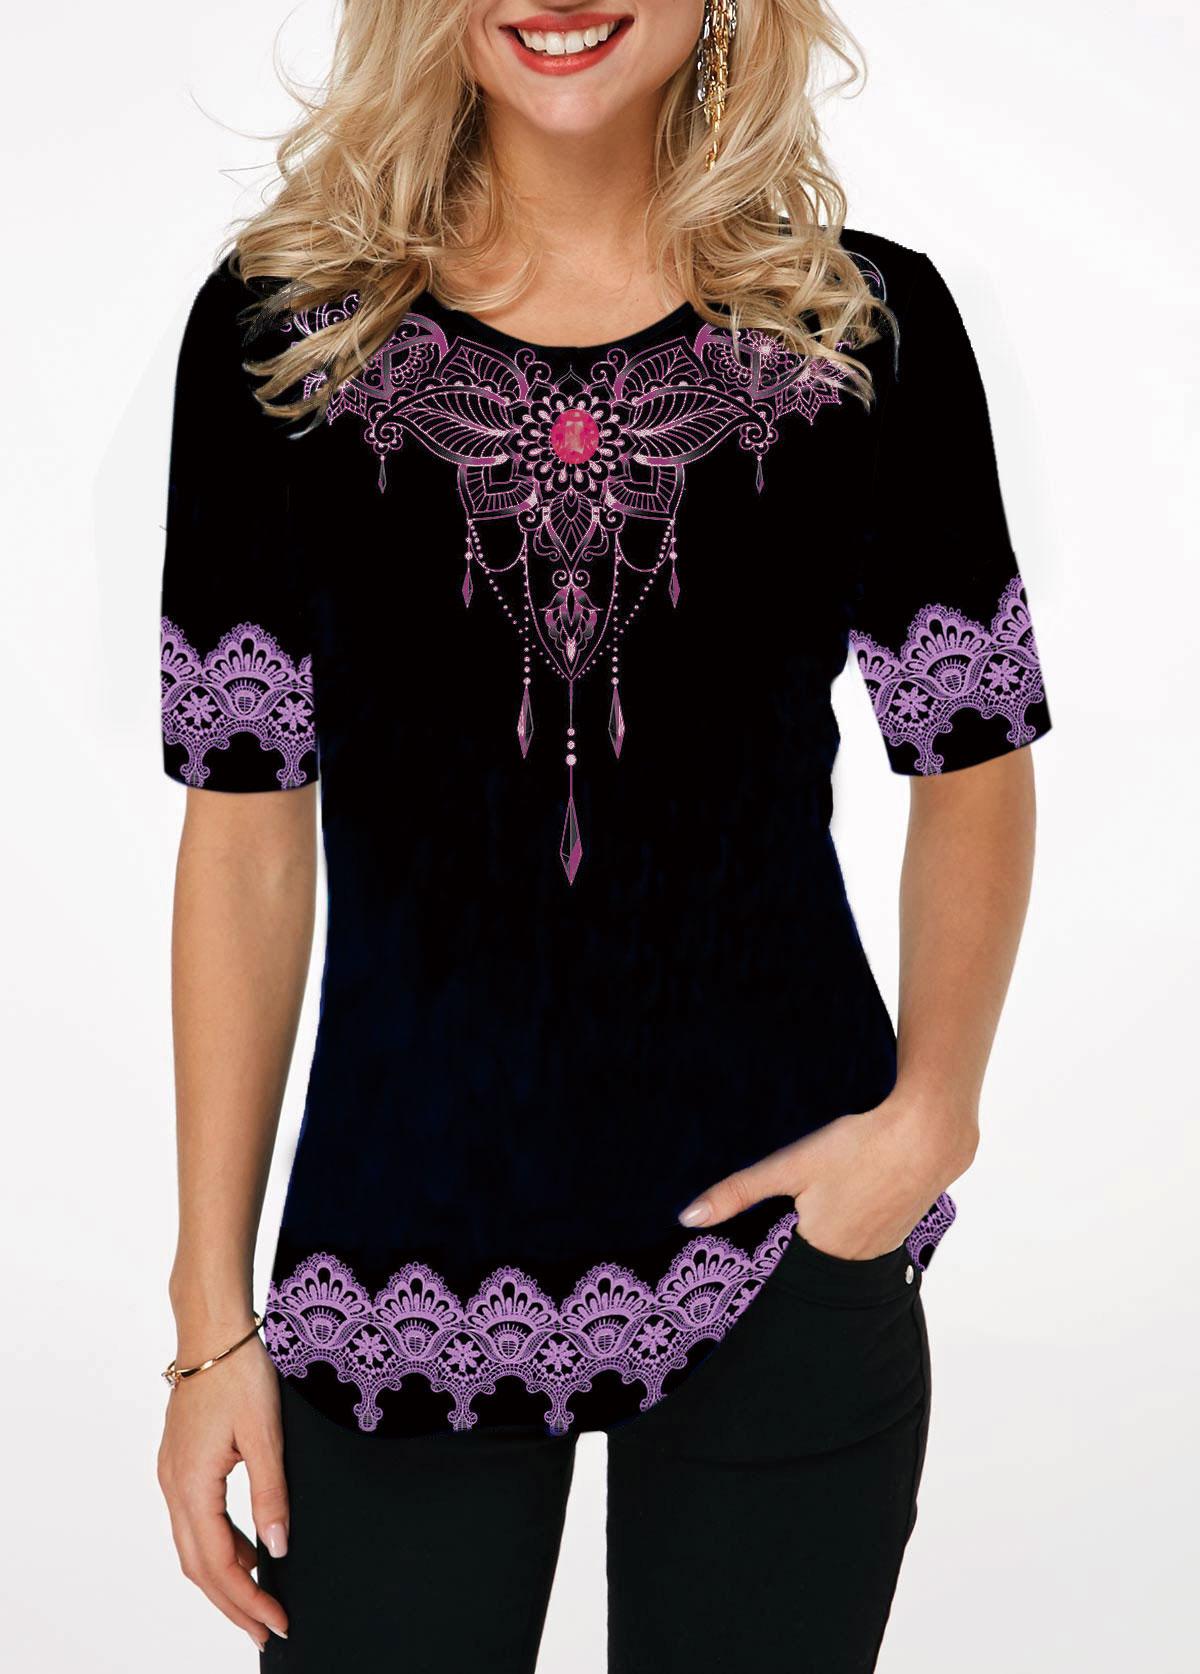 Tribal Print Rhinestone Embellished Round Neck T Shirt